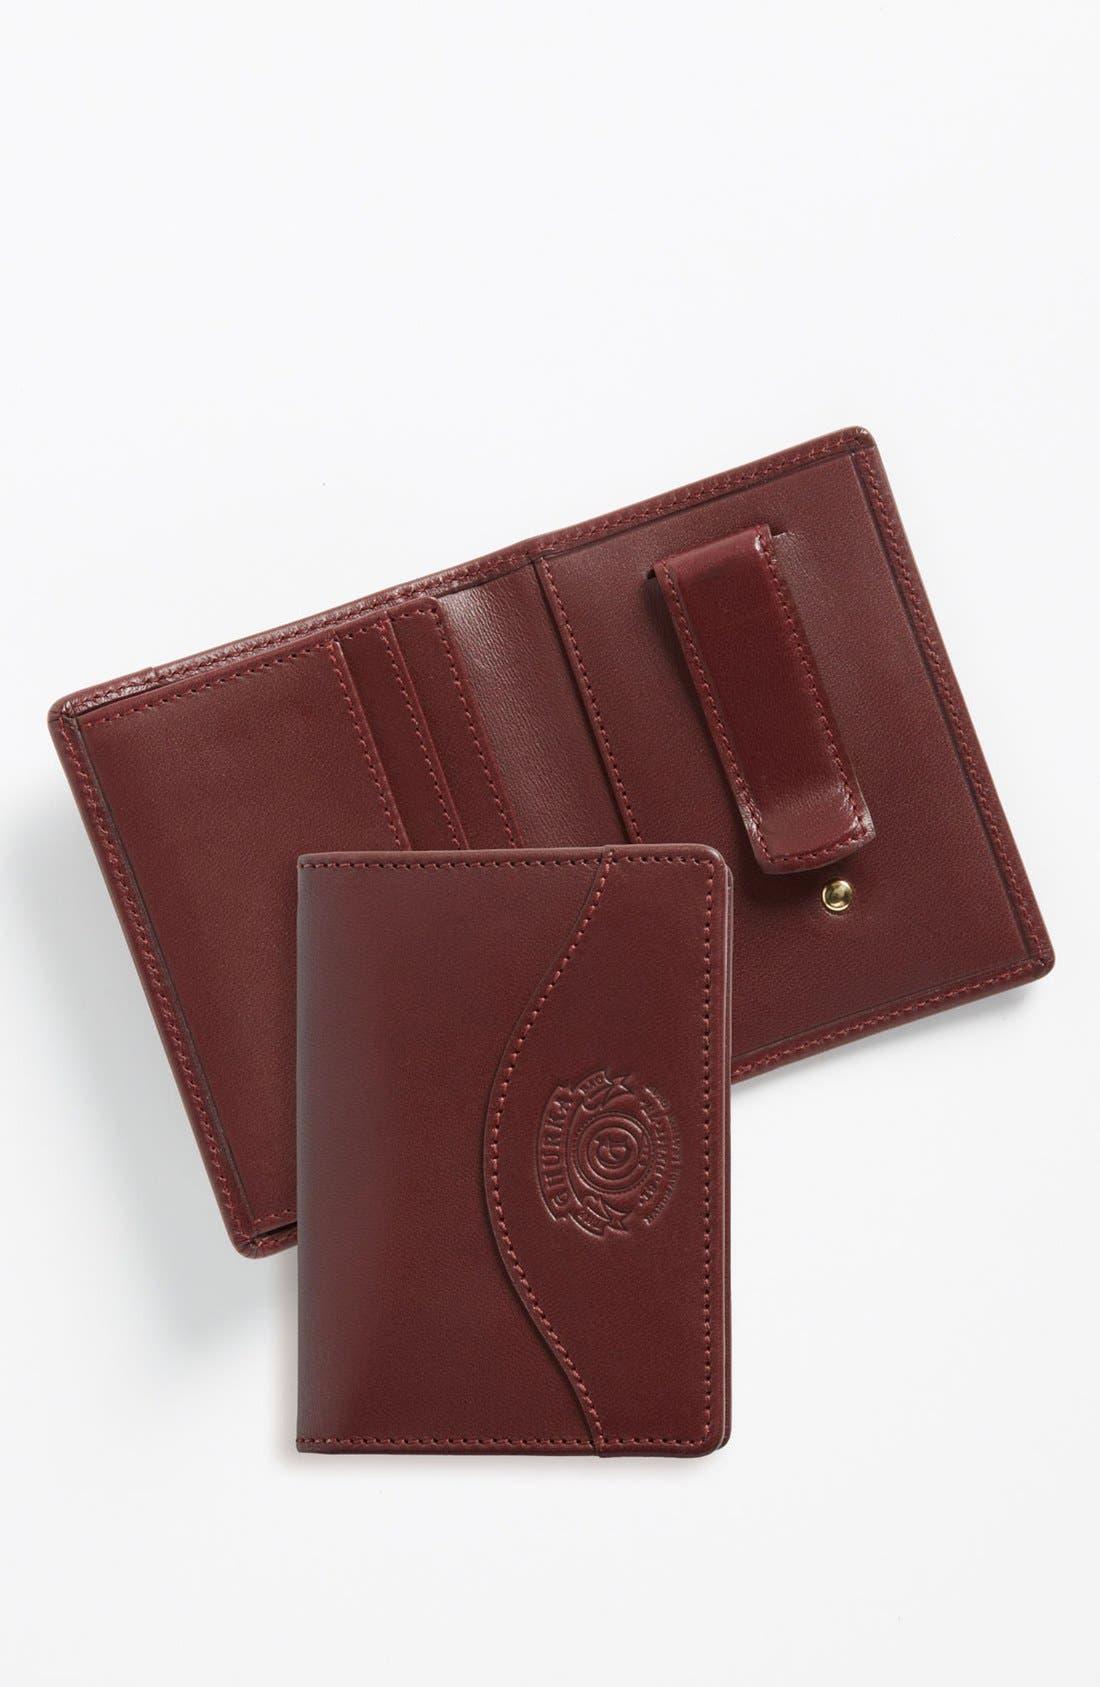 Alternate Image 1 Selected - Ghurka Leather Money Clip Wallet